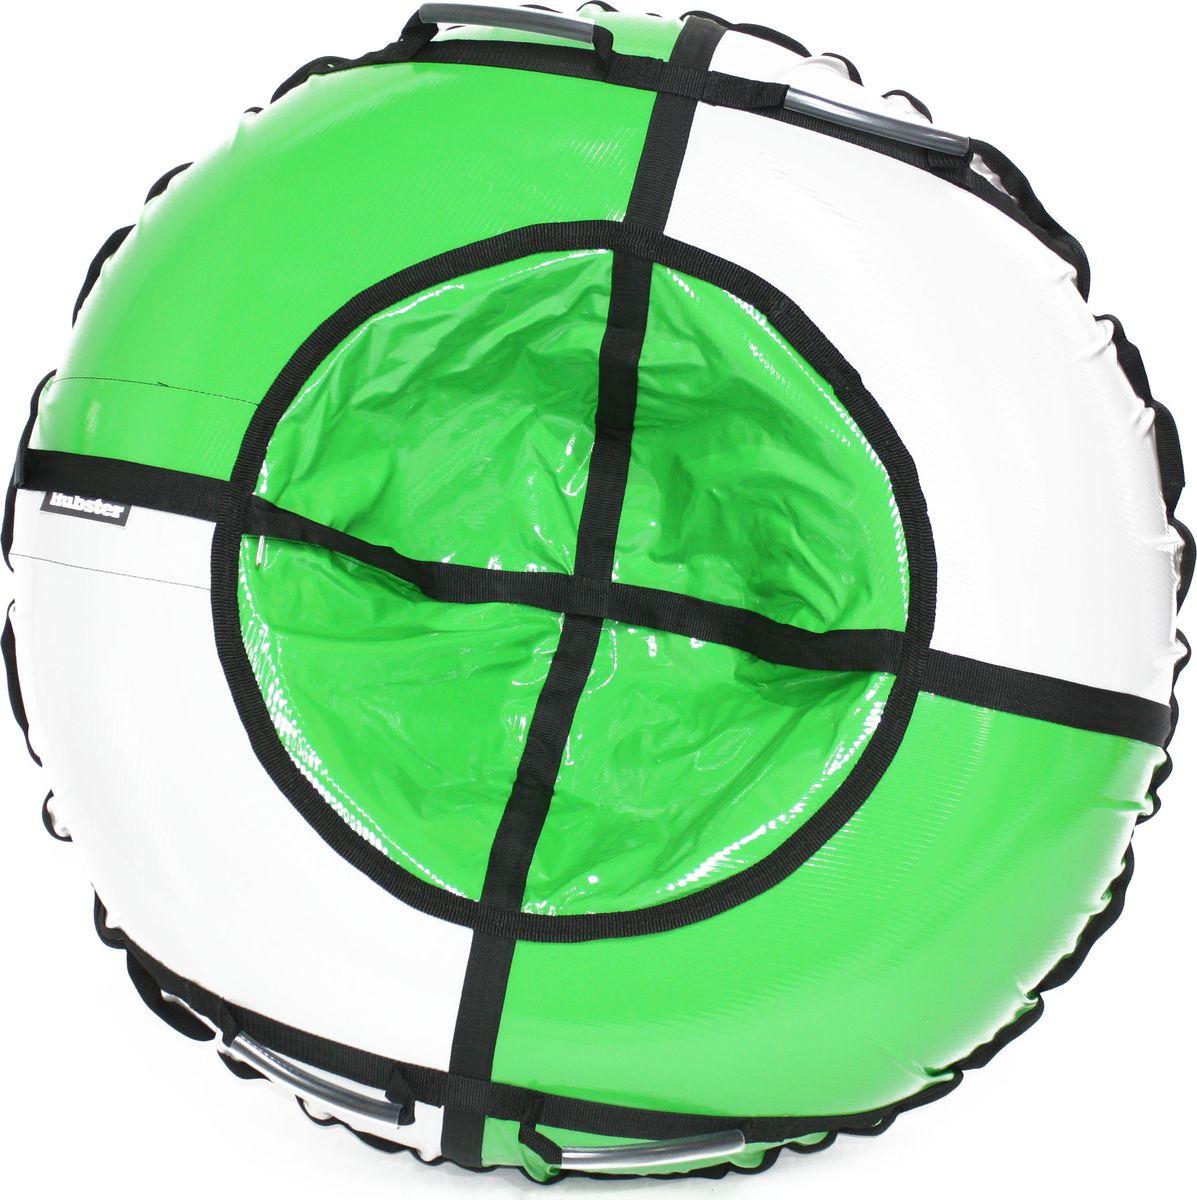 Тюбинг Hubster Sport Plus, цвет: серый, зеленый, диаметр 105 смво4327-1